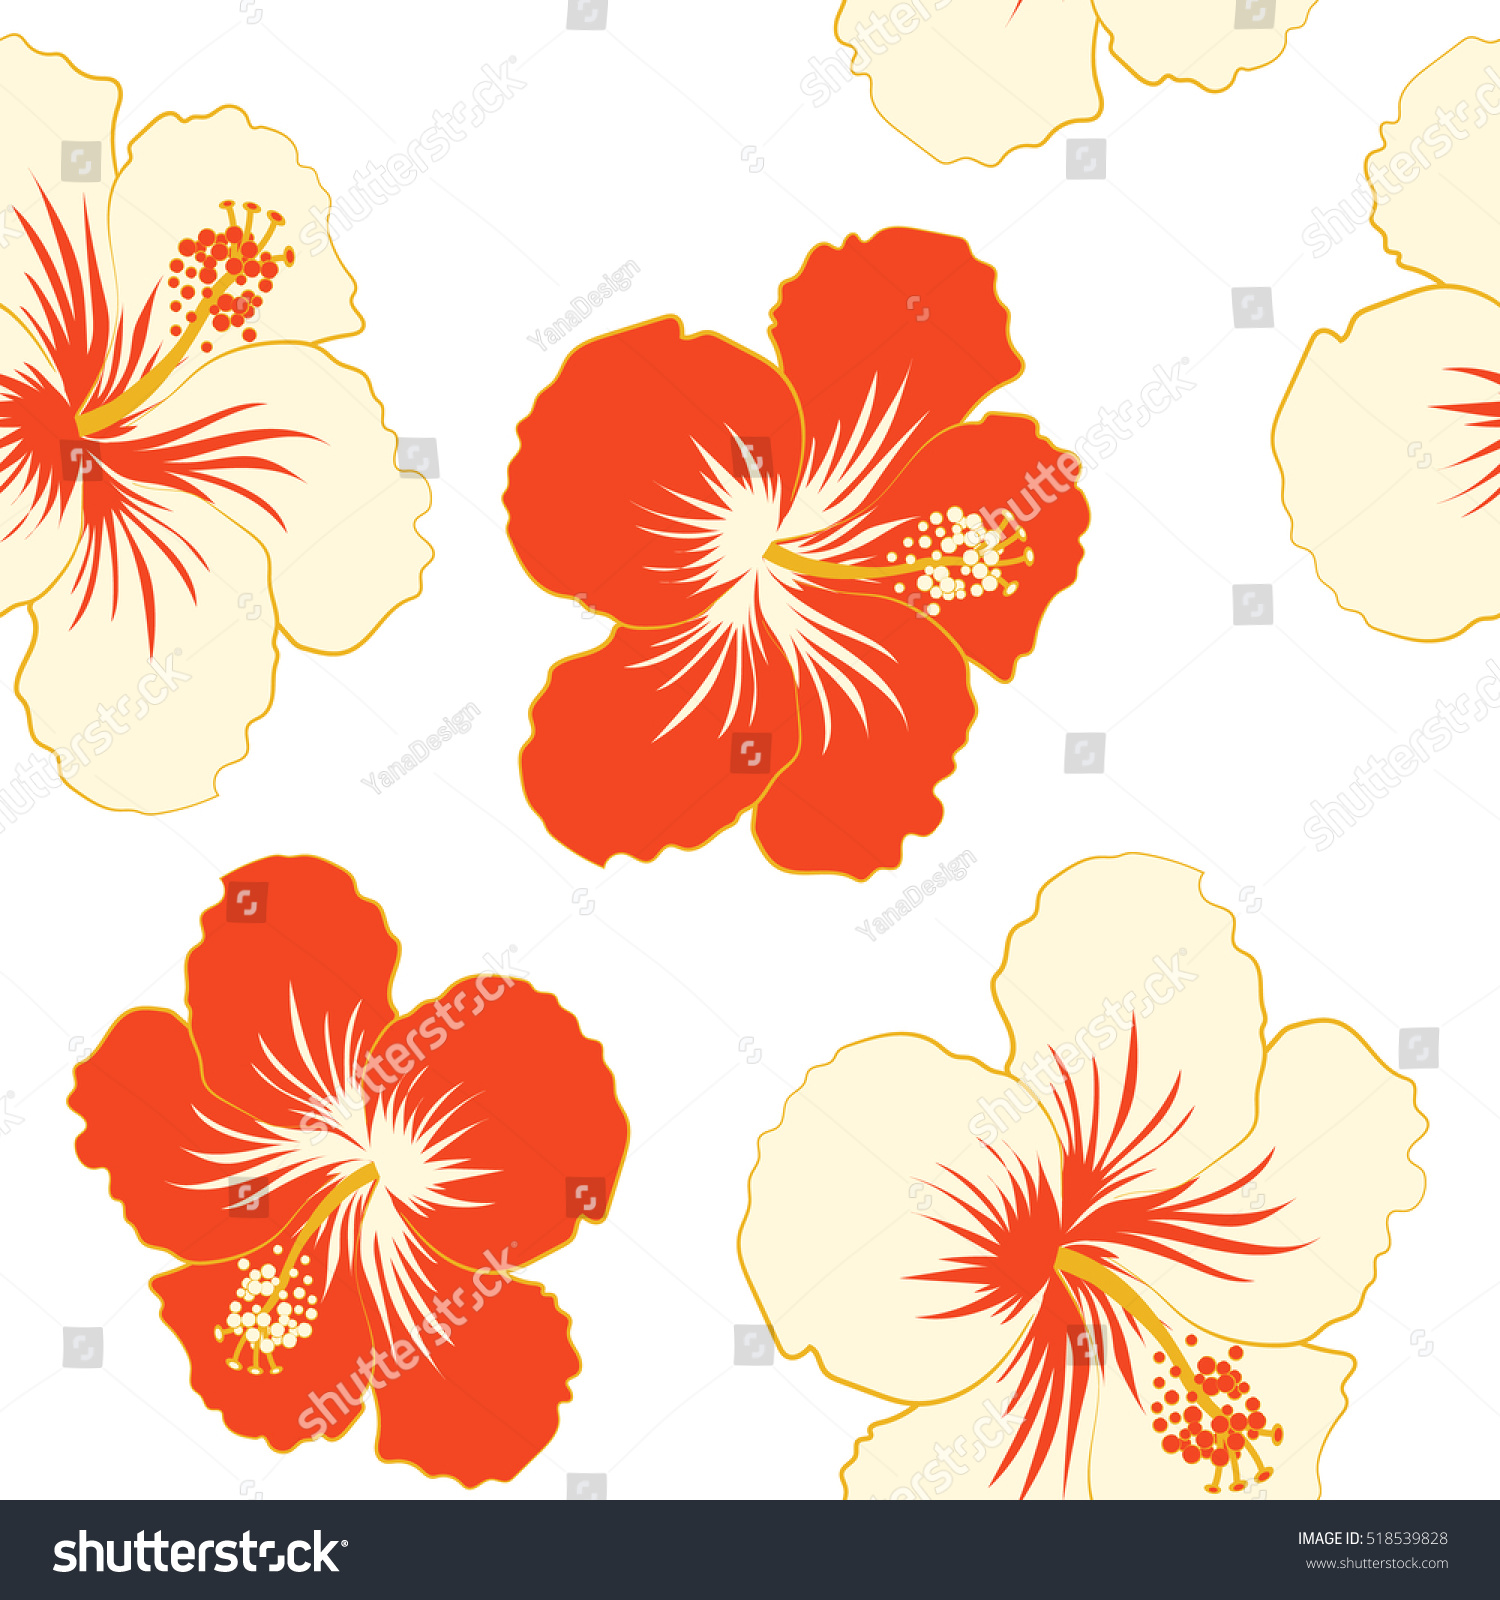 Aloha Hawaii Luau Party Invitation On Stock Vector (Royalty Free ...